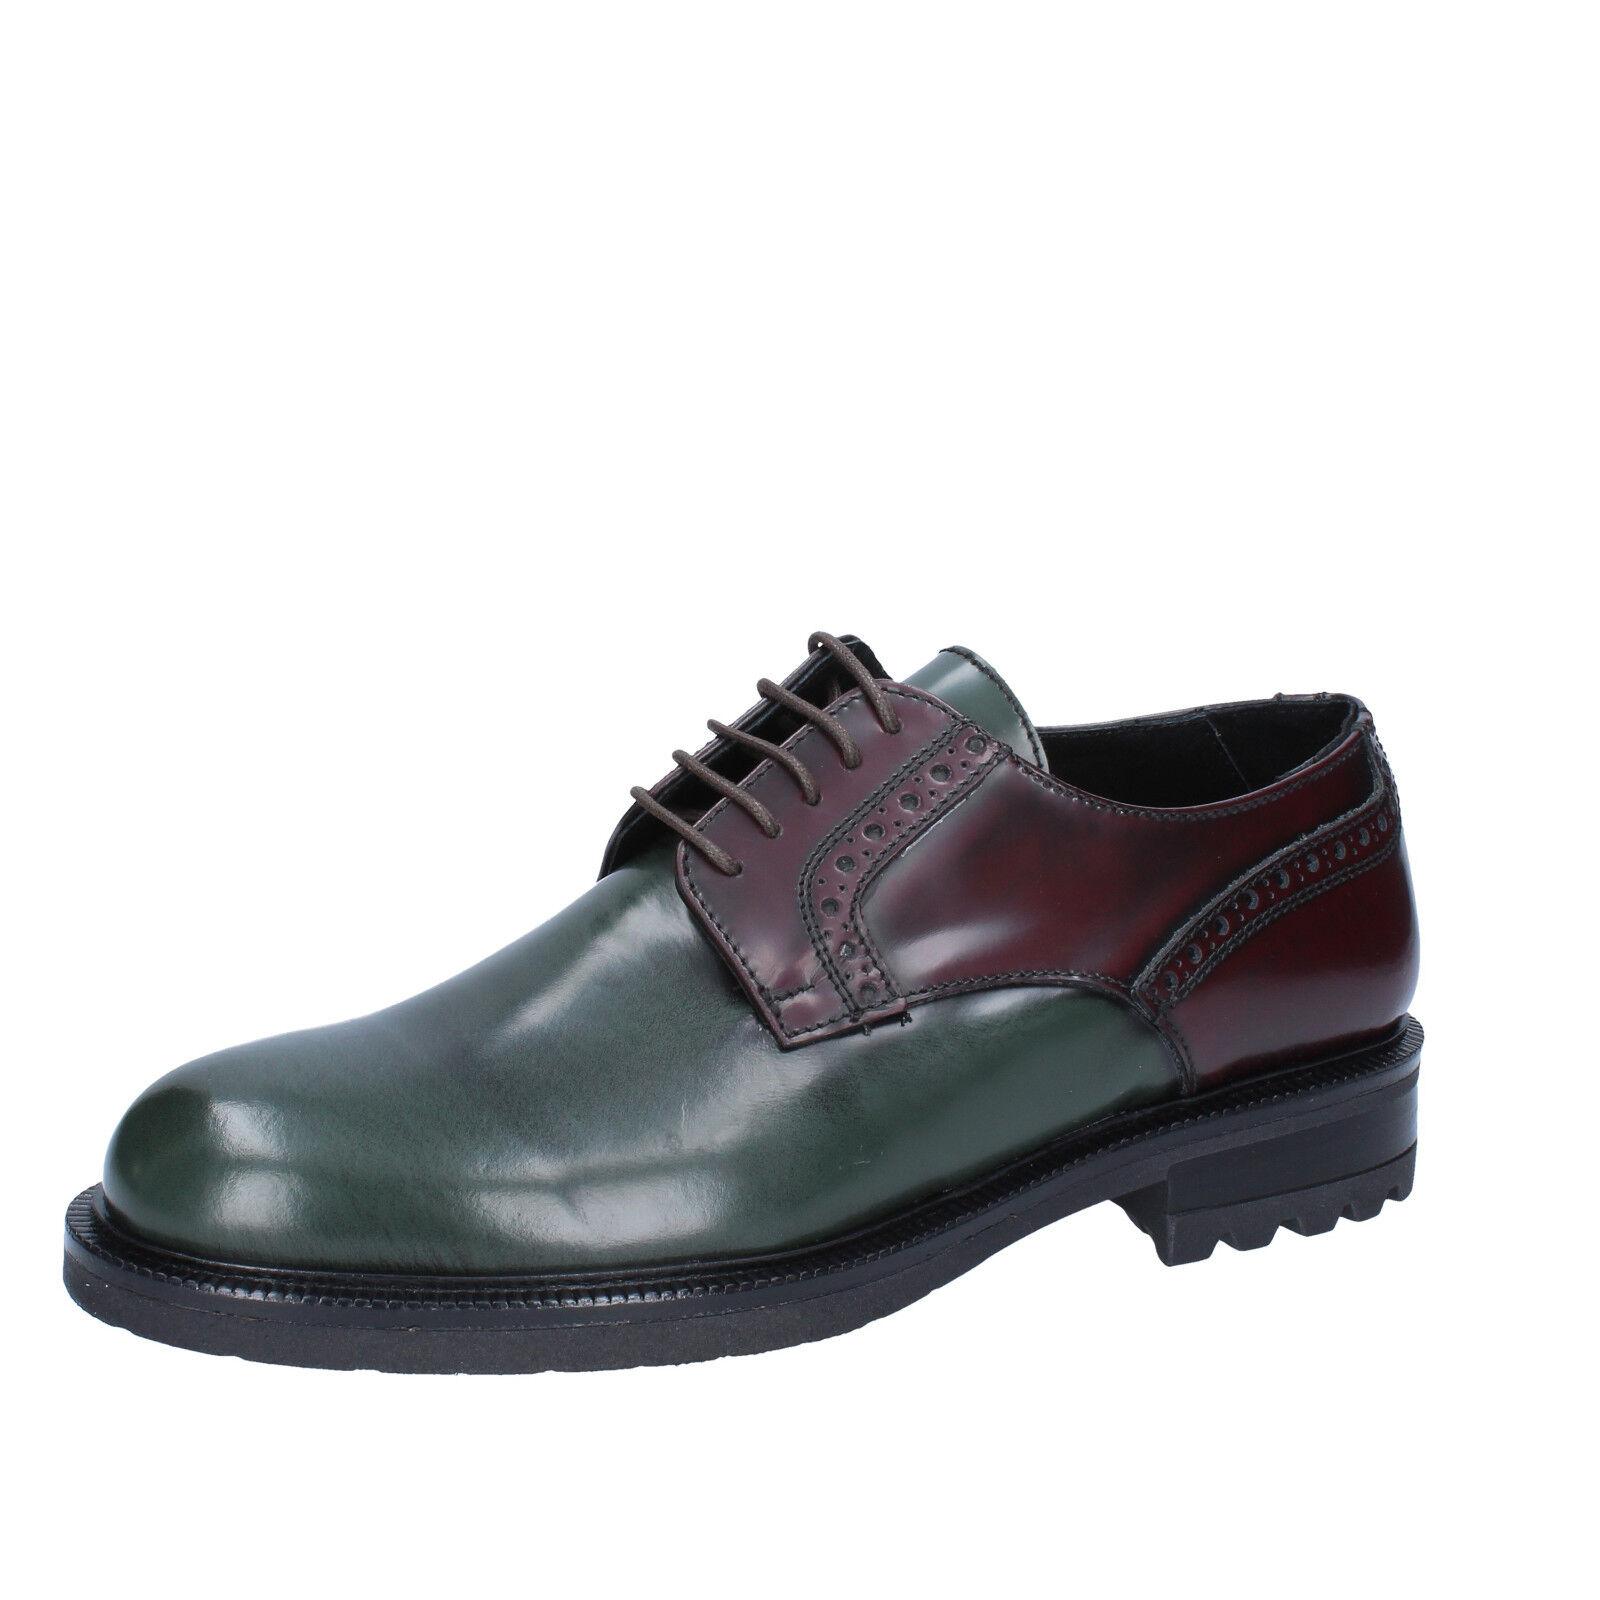 Men's shoes SALVO BARONE 8 (EU 41) elegant burgundy green shiny leather BZ183-C